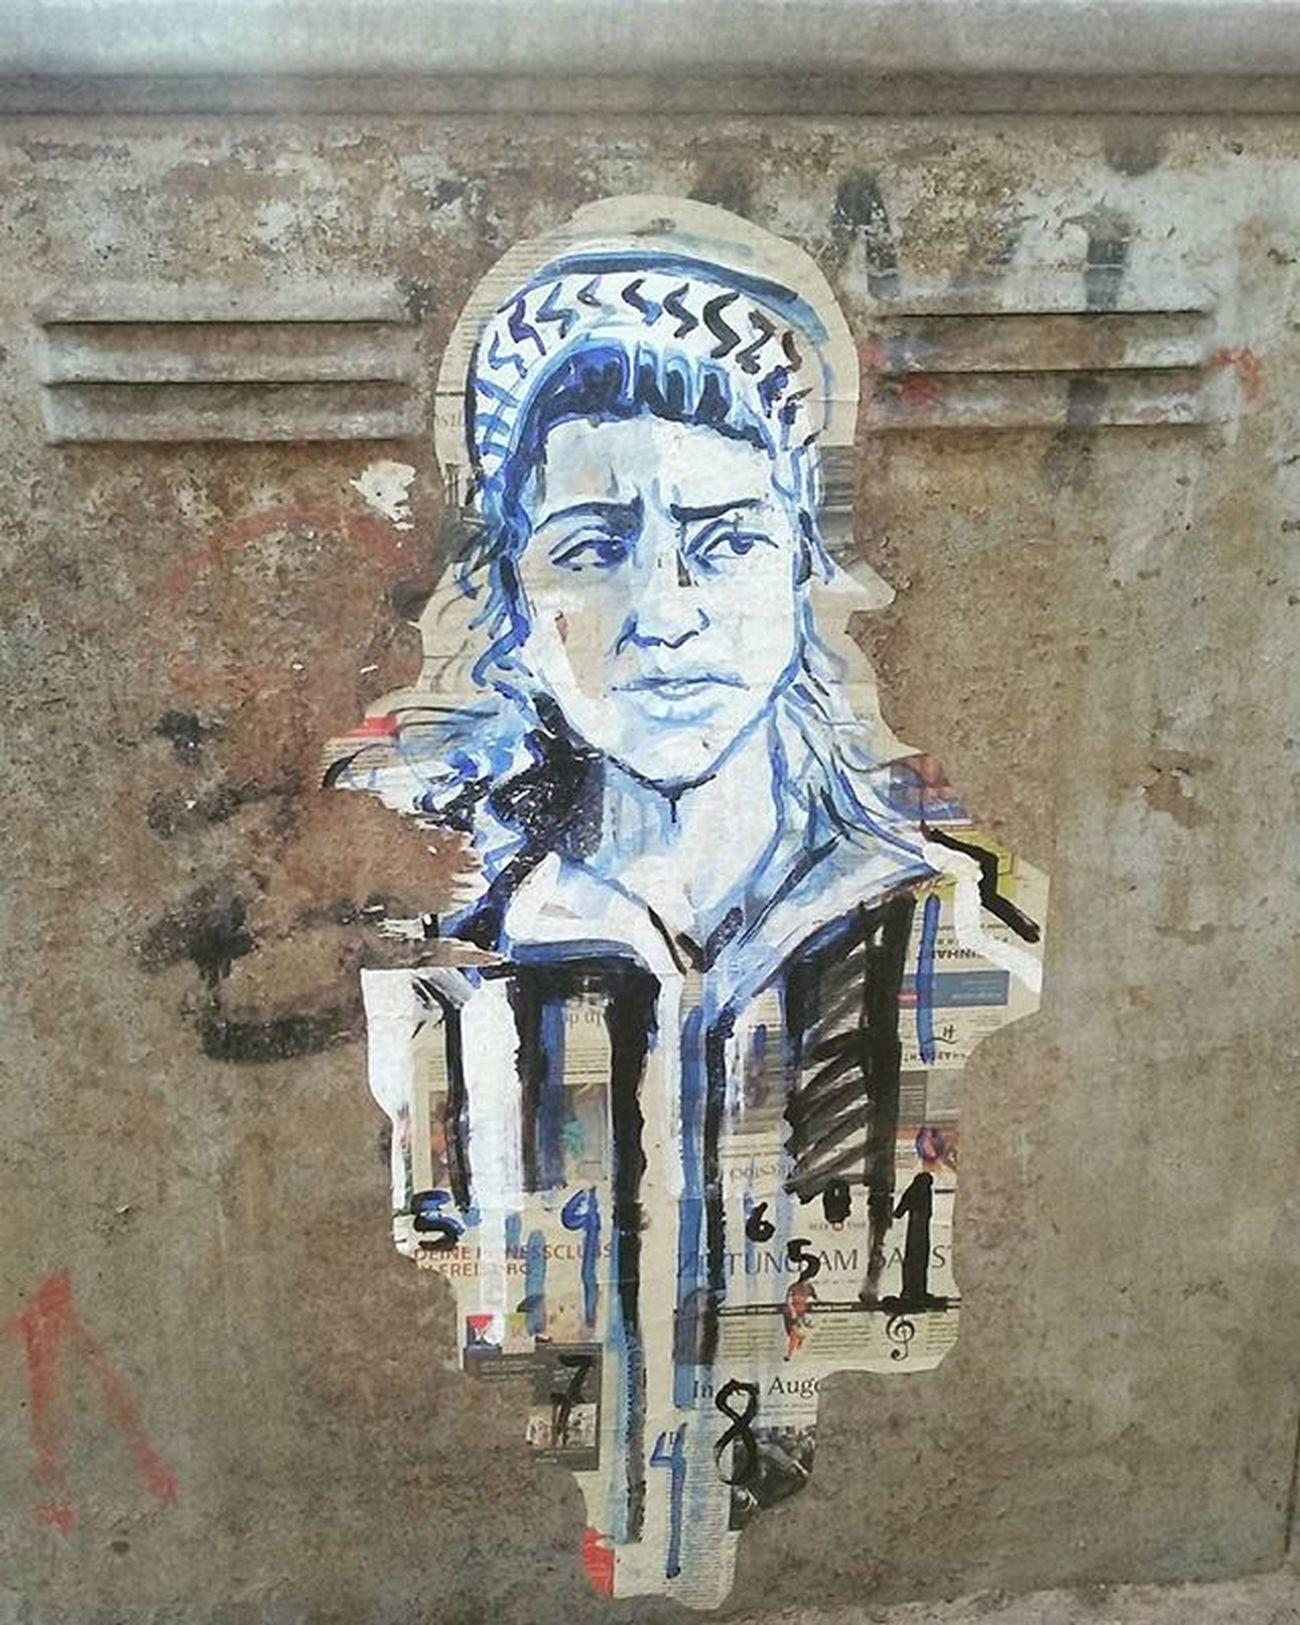 Streetart Drawing Woman Graffiti Athens Greece Athensstreetart Instapic Instalike Instadaily Picoftheday Pictureoftheday Instastreetart Instaathens Athensvoice Popagandagr Lifo